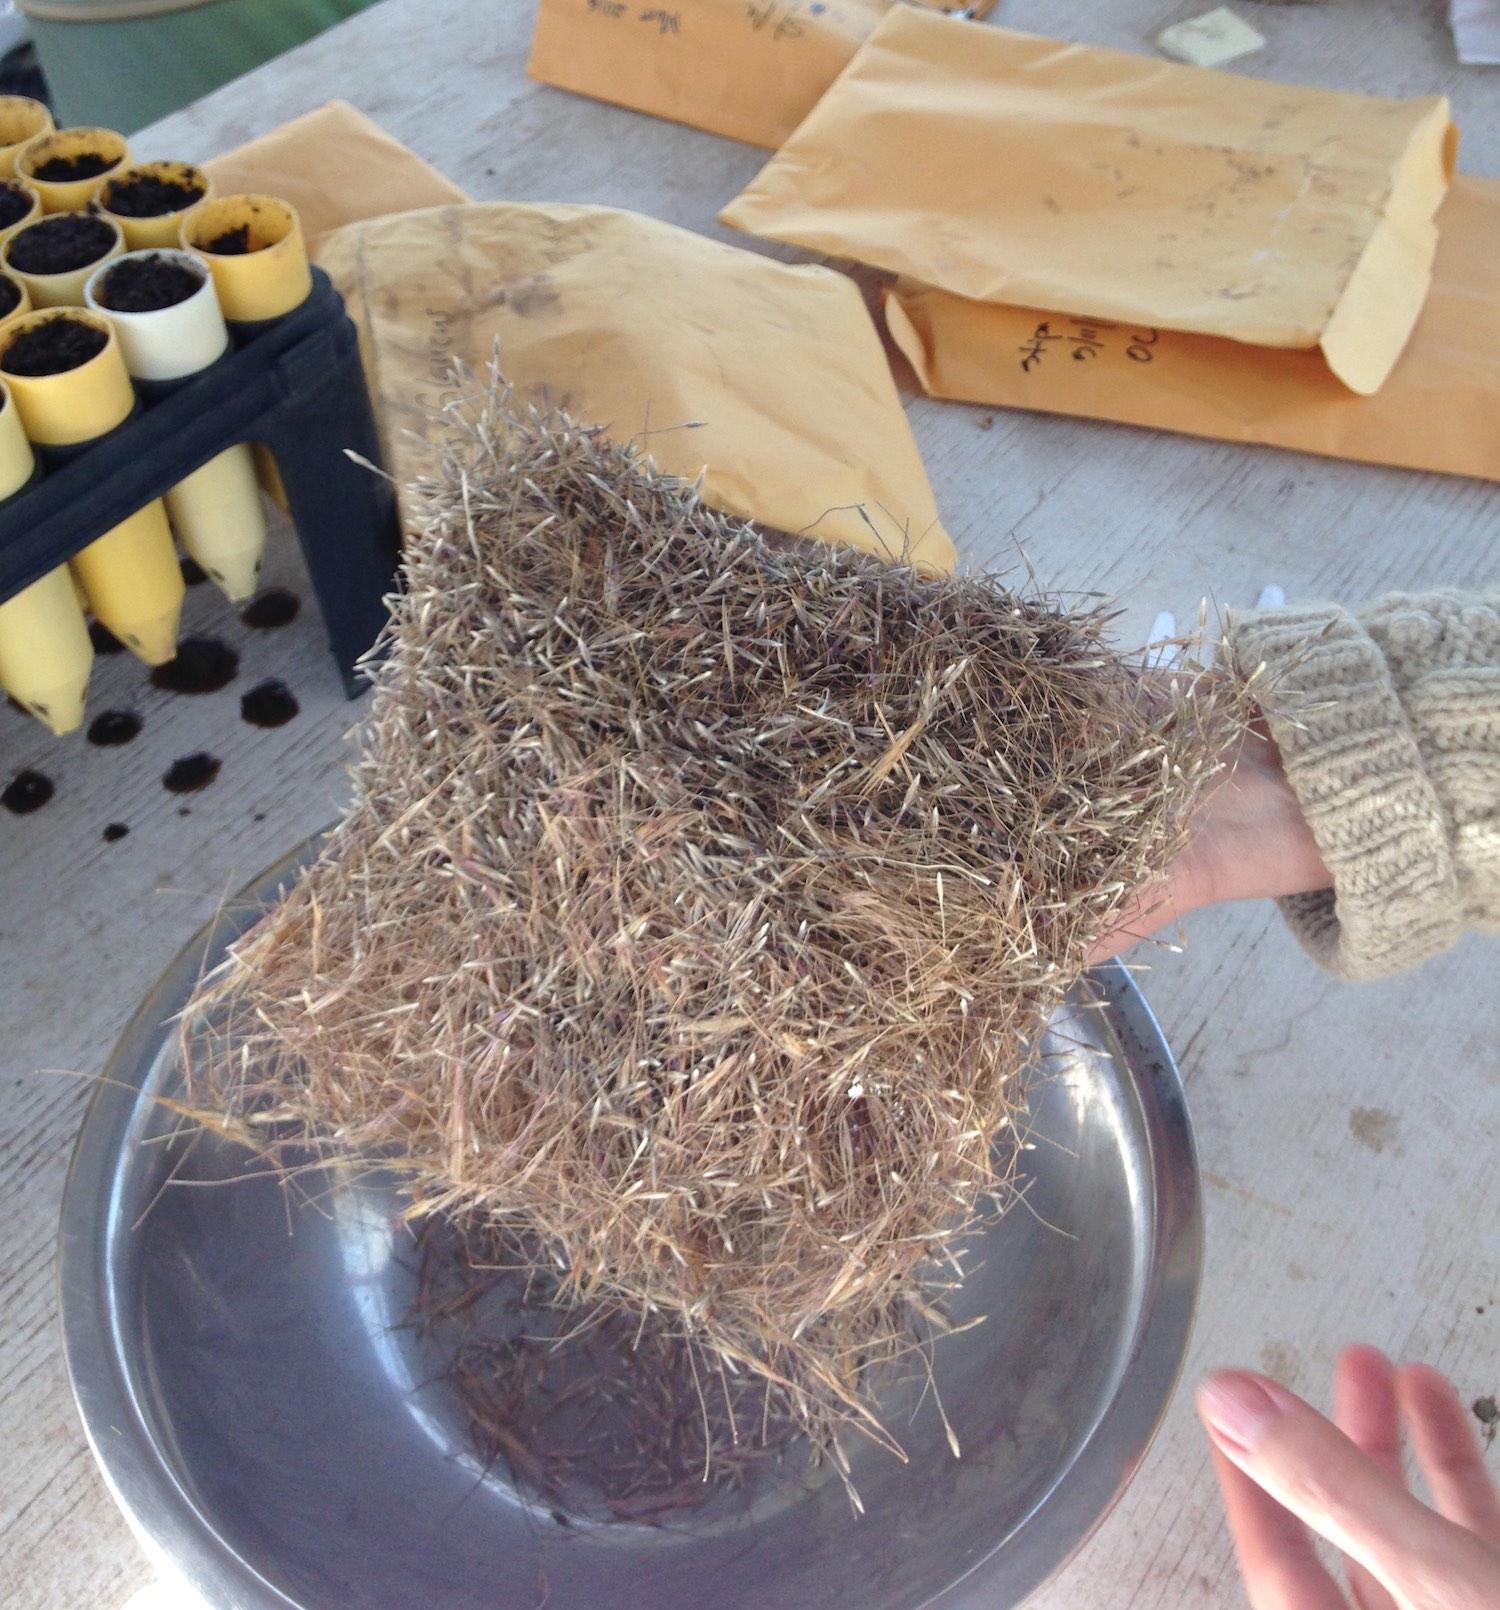 Purple needle grass seeds -  Stipa pulchra